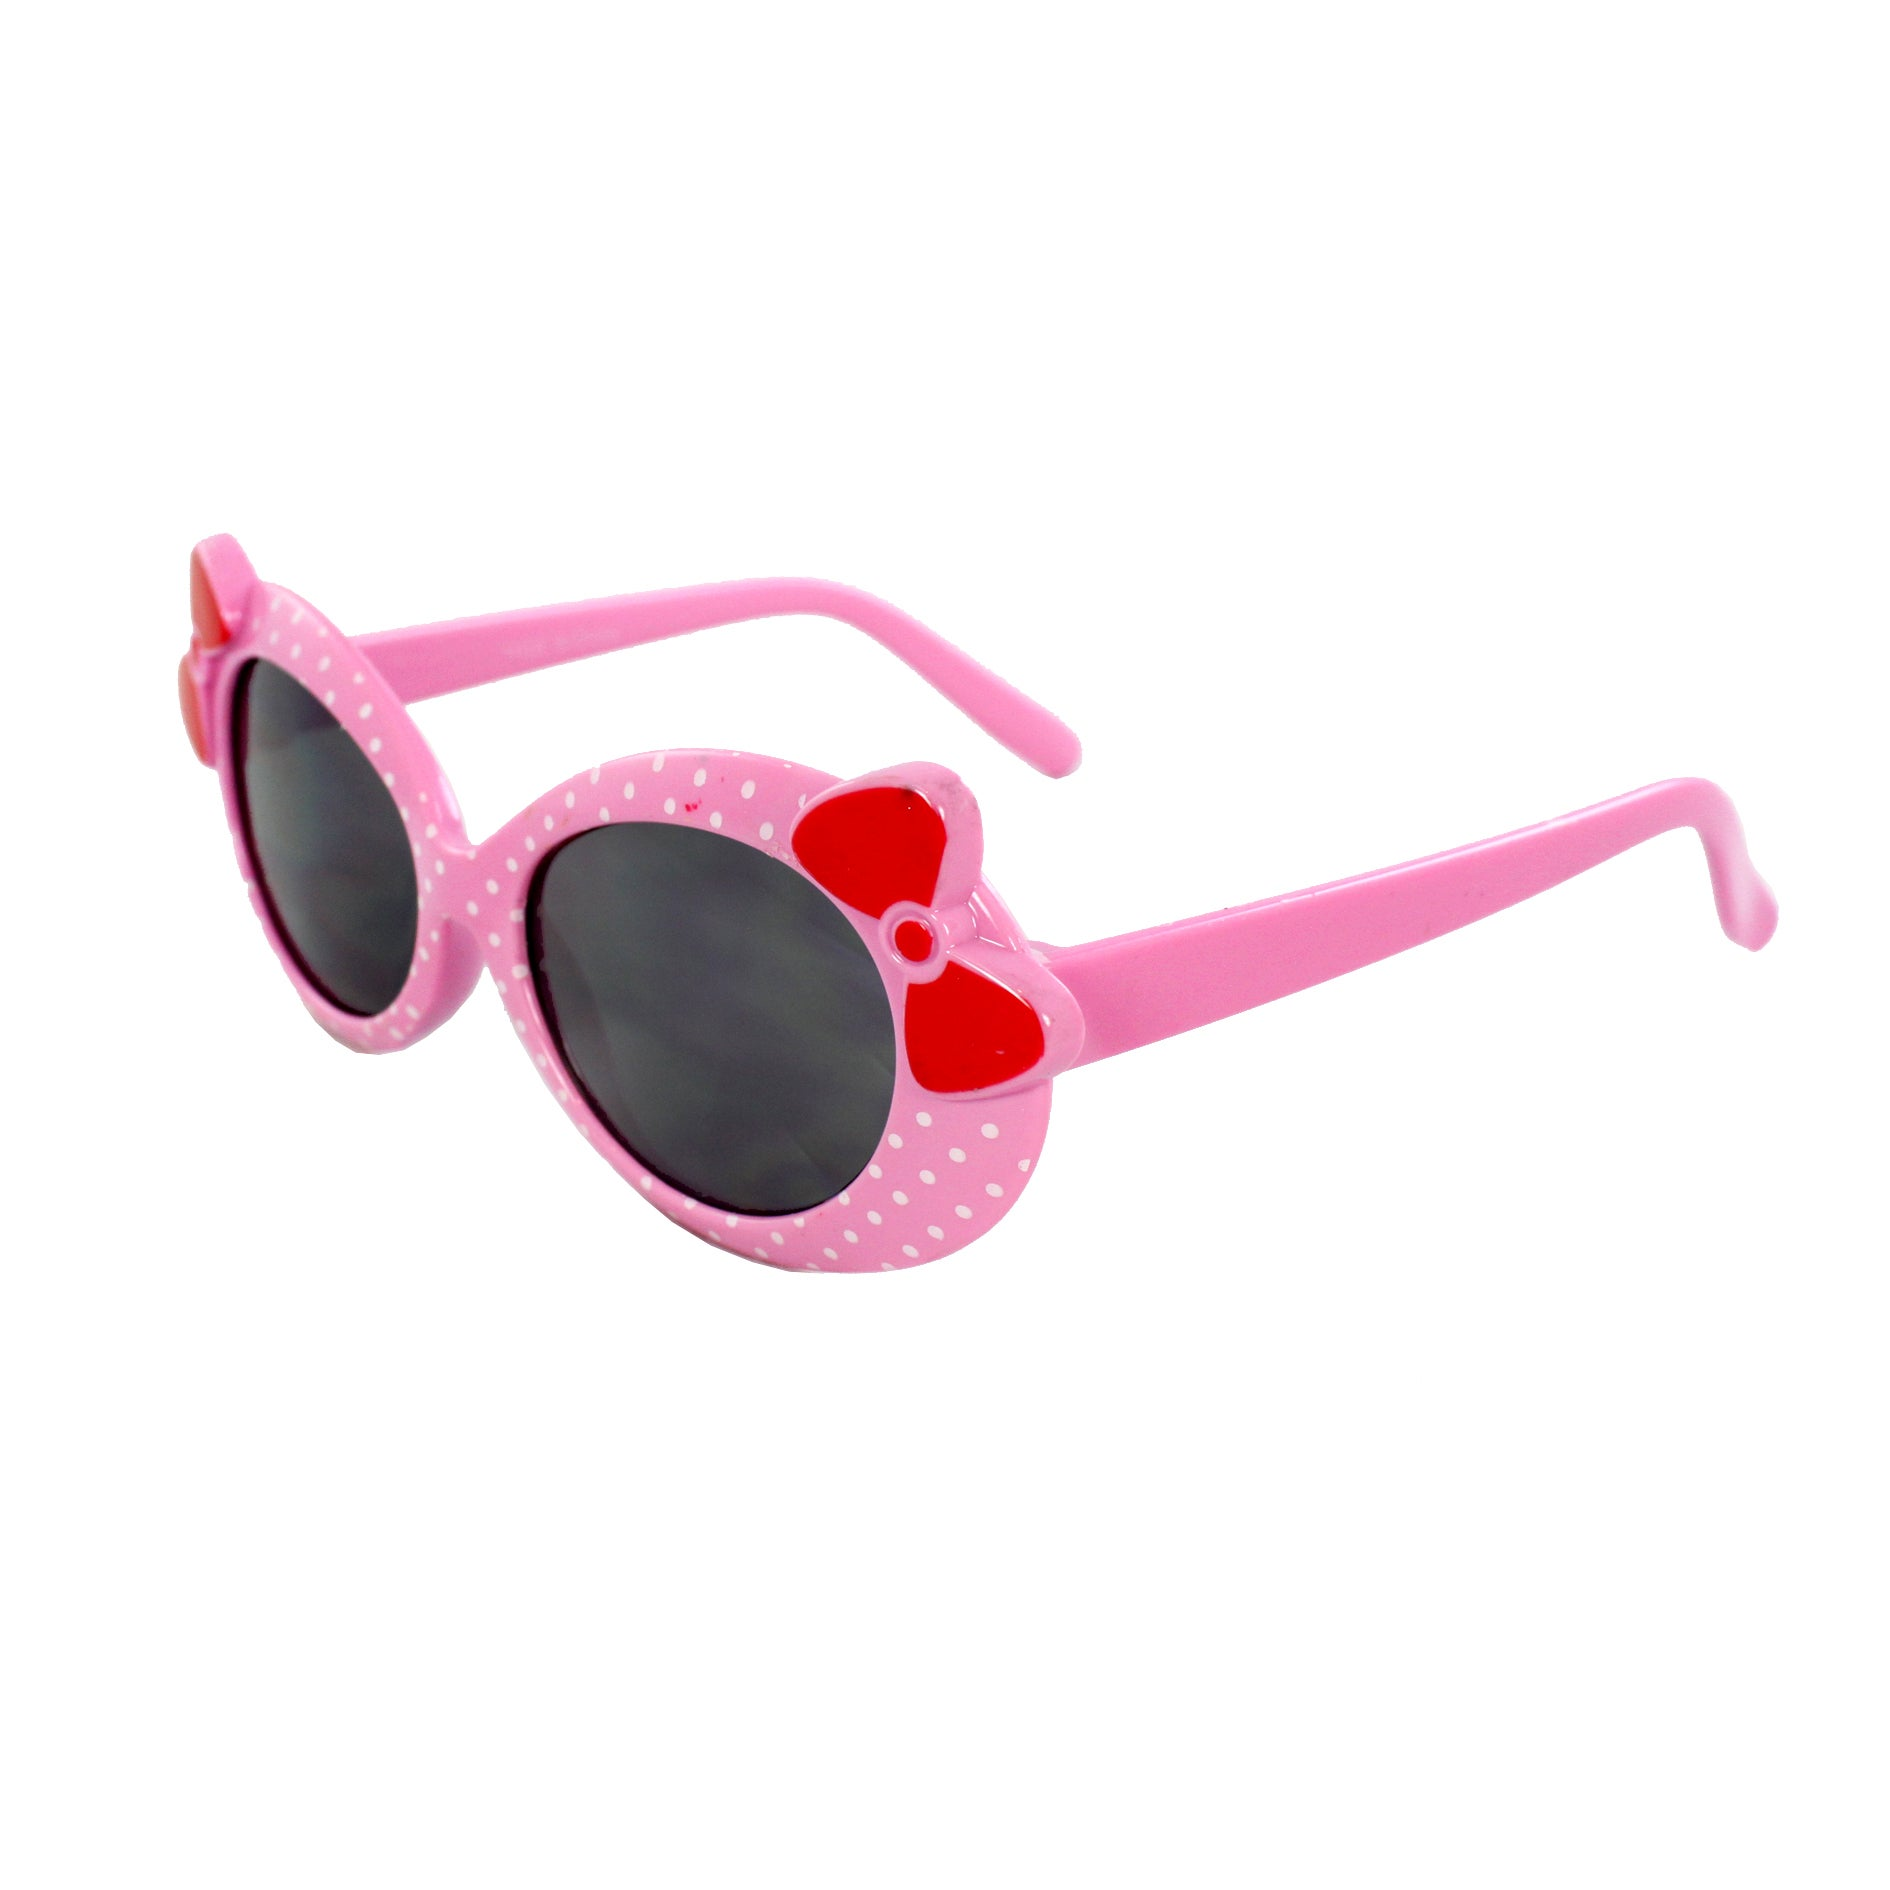 Kid's K0208-PKSM Oval Fashion Pink Frame Polka Dot Sunglasses